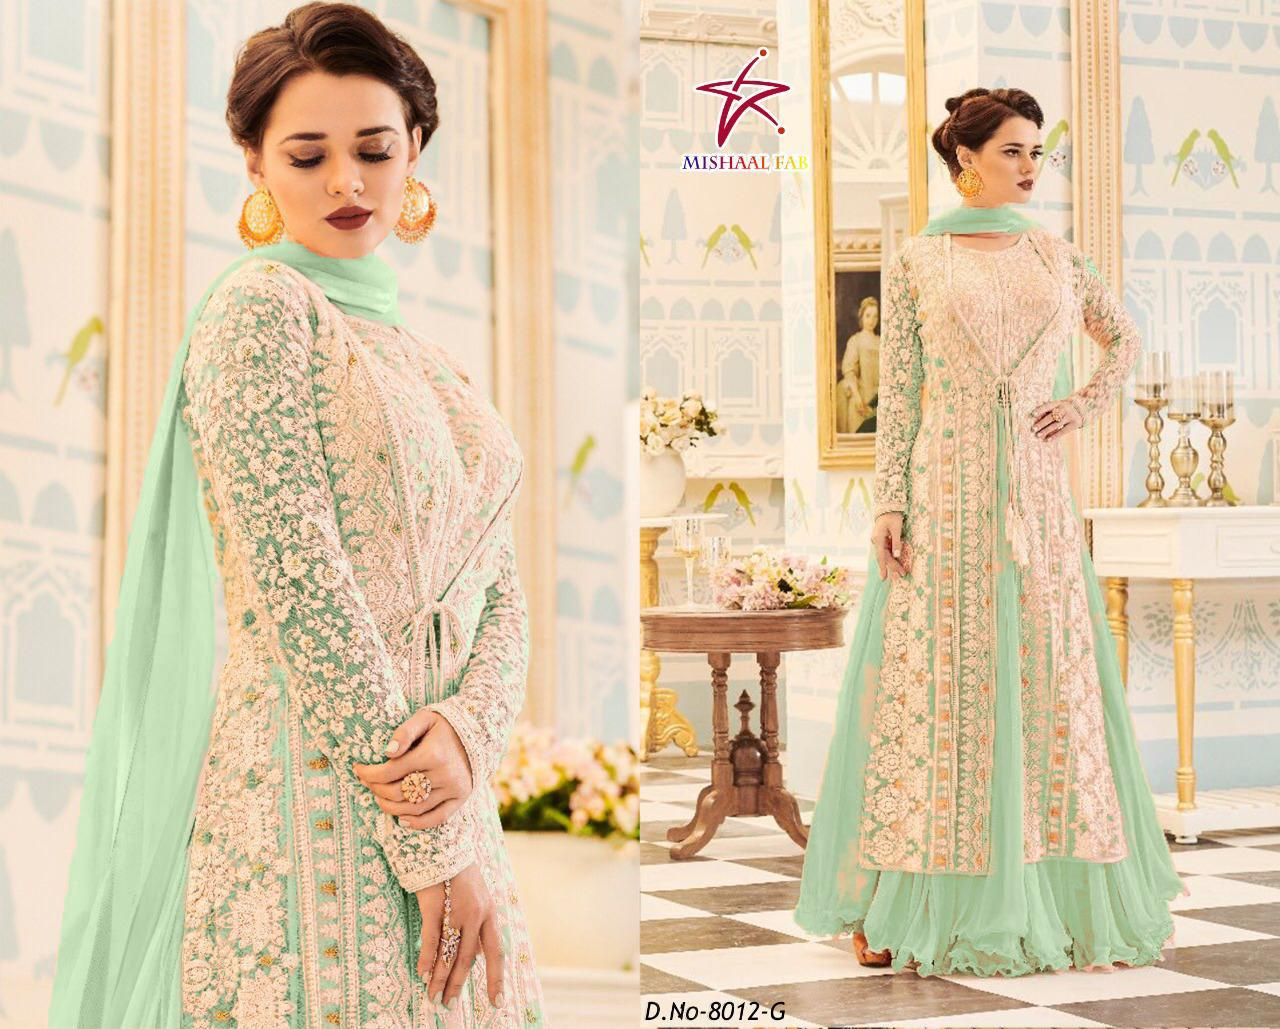 Mishaal Fab 8012 Designer Heavy Georgette Suit